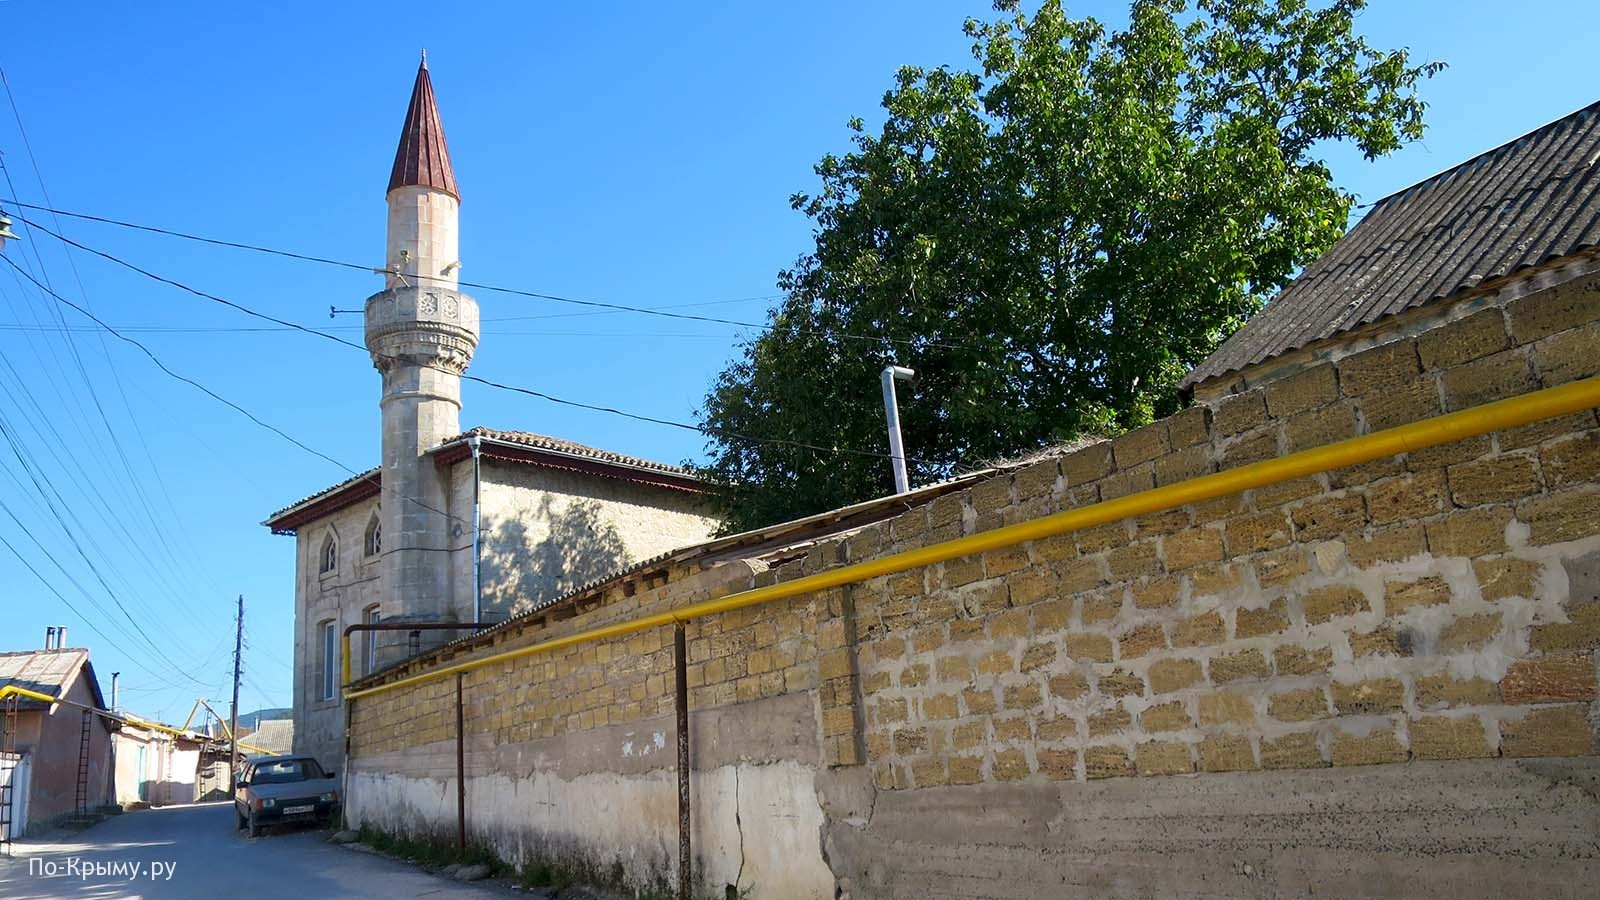 Мечеть Молла Мустафа Джами, Бахчисарай